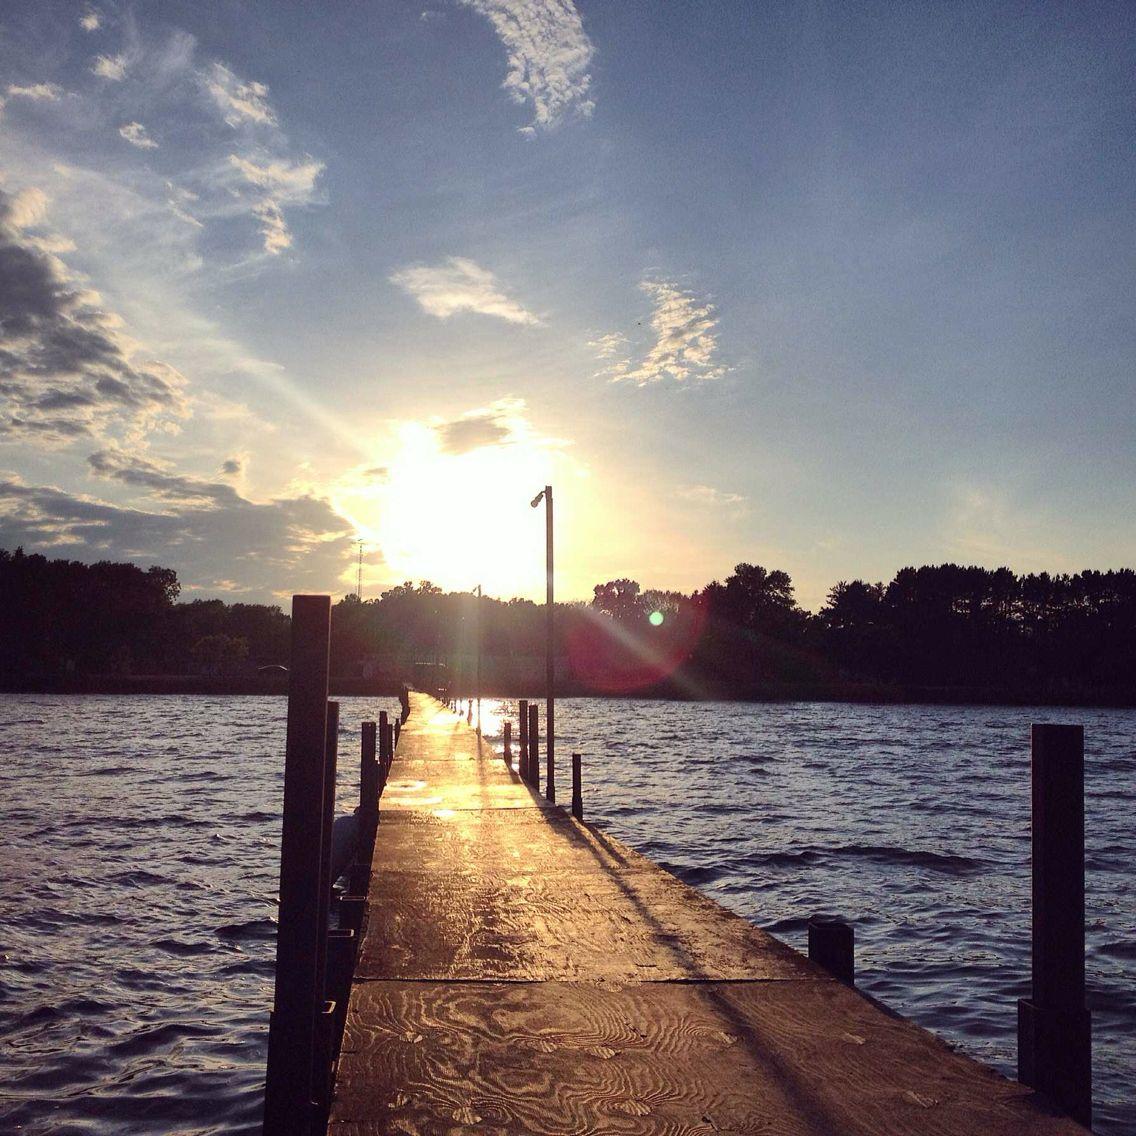 MilleLacs Lake. Garrison, MN. August 8, 2014.